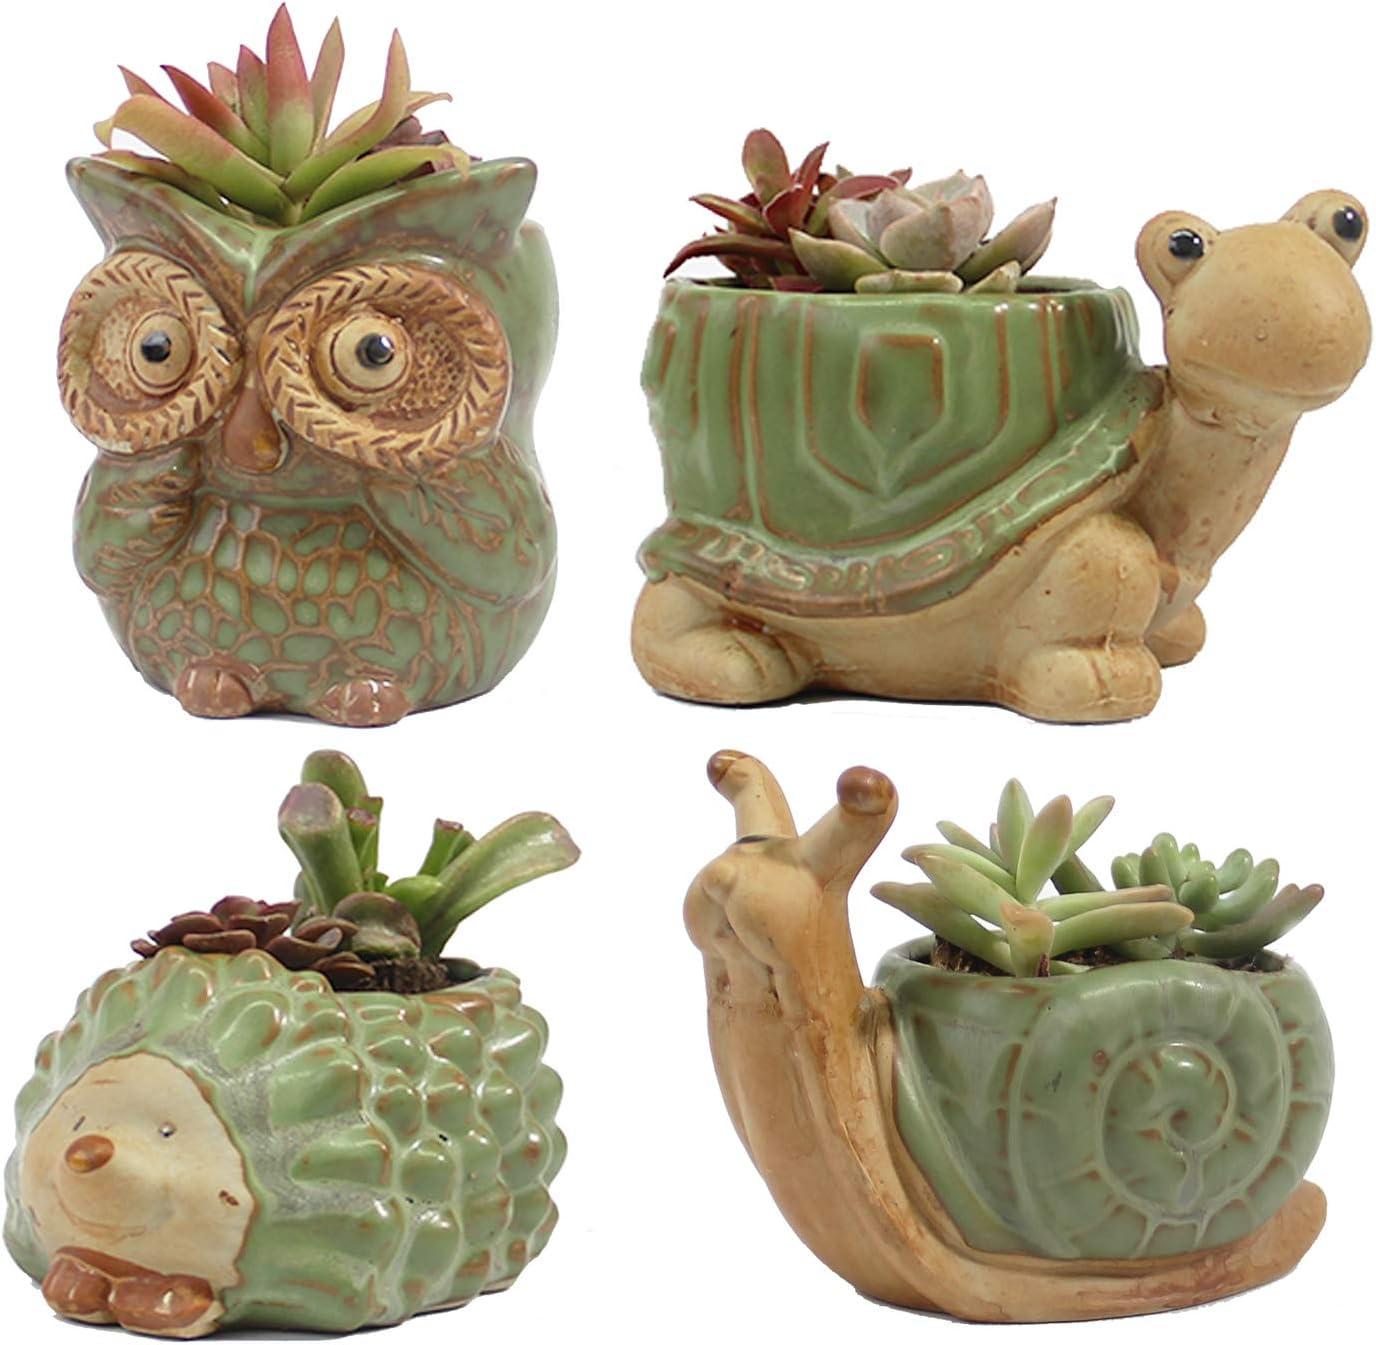 SUNSMIL Small Ceramic Succulent Pot with Drainage, Animal Succulent Planter, 4.4 Inch Flower Pots, for Flower, Cactus, Mini Succulent Plants, Home Office Decor, Set of 4 Garden Gift